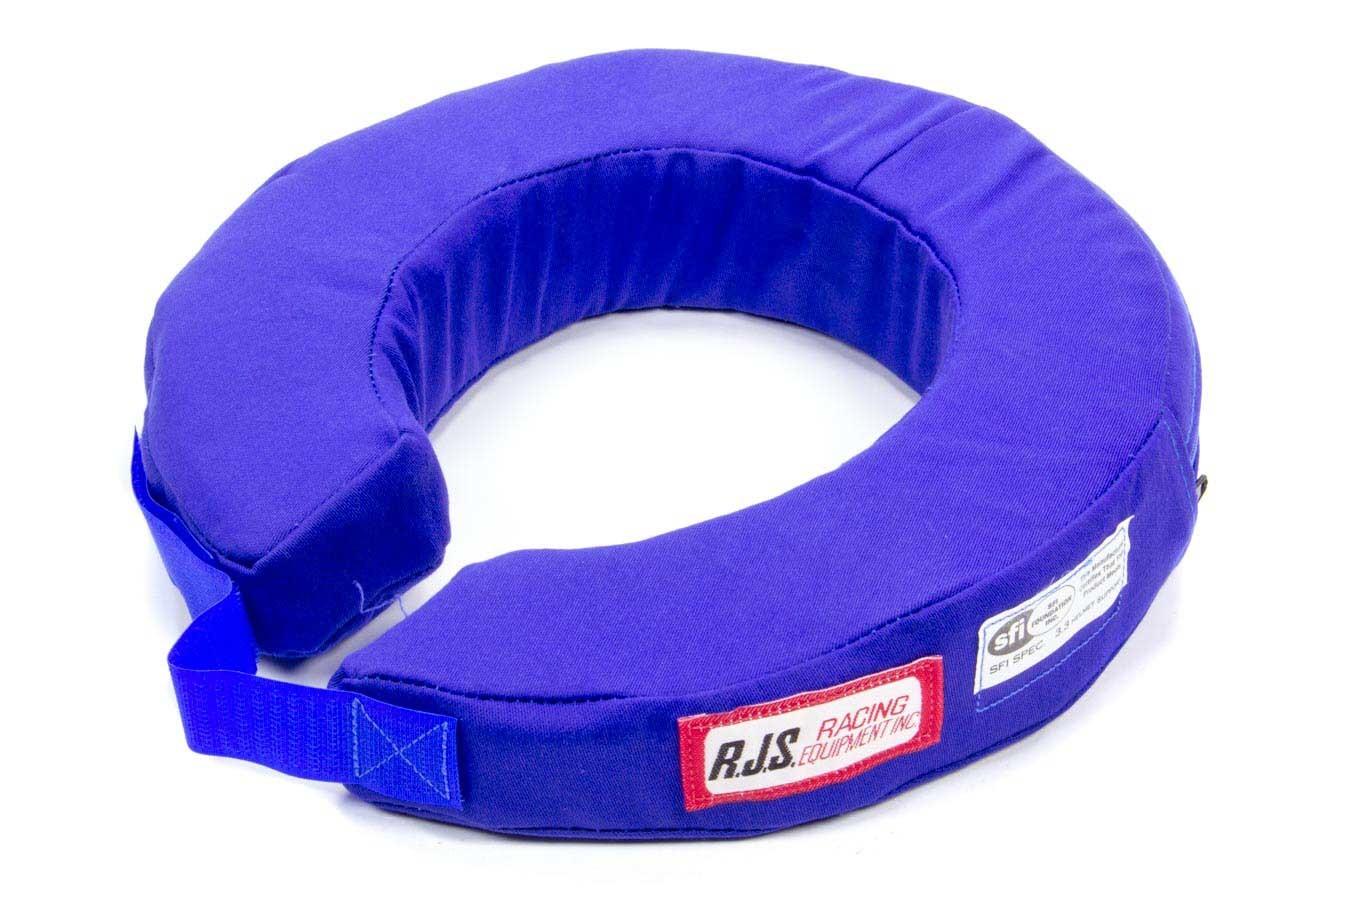 Rjs Safety Neck Collar 360 Blue SFI